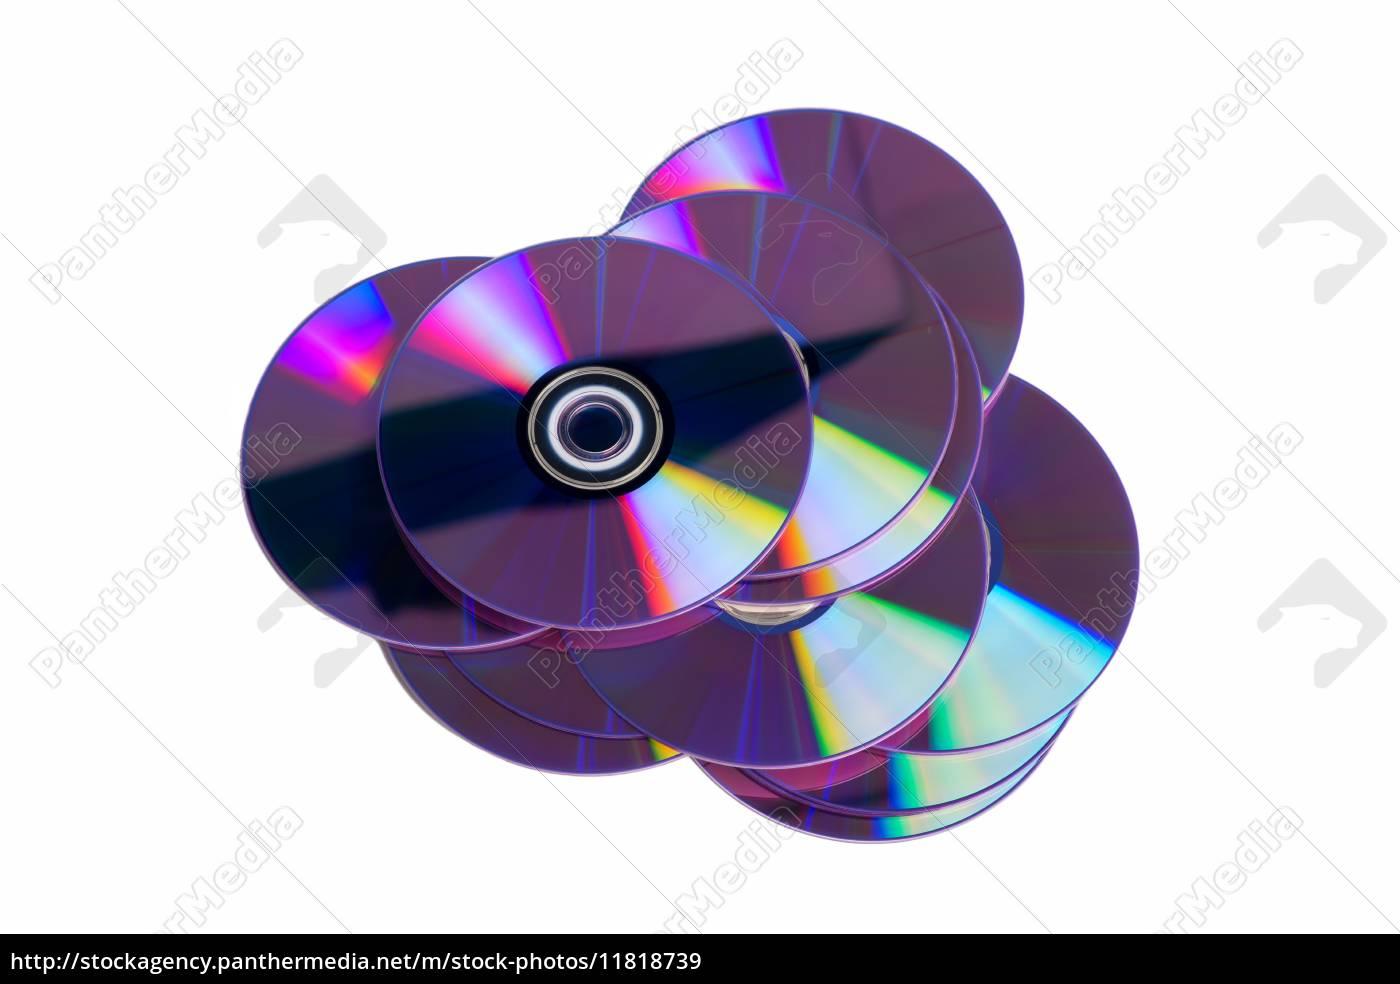 cd, rohlinge - 11818739